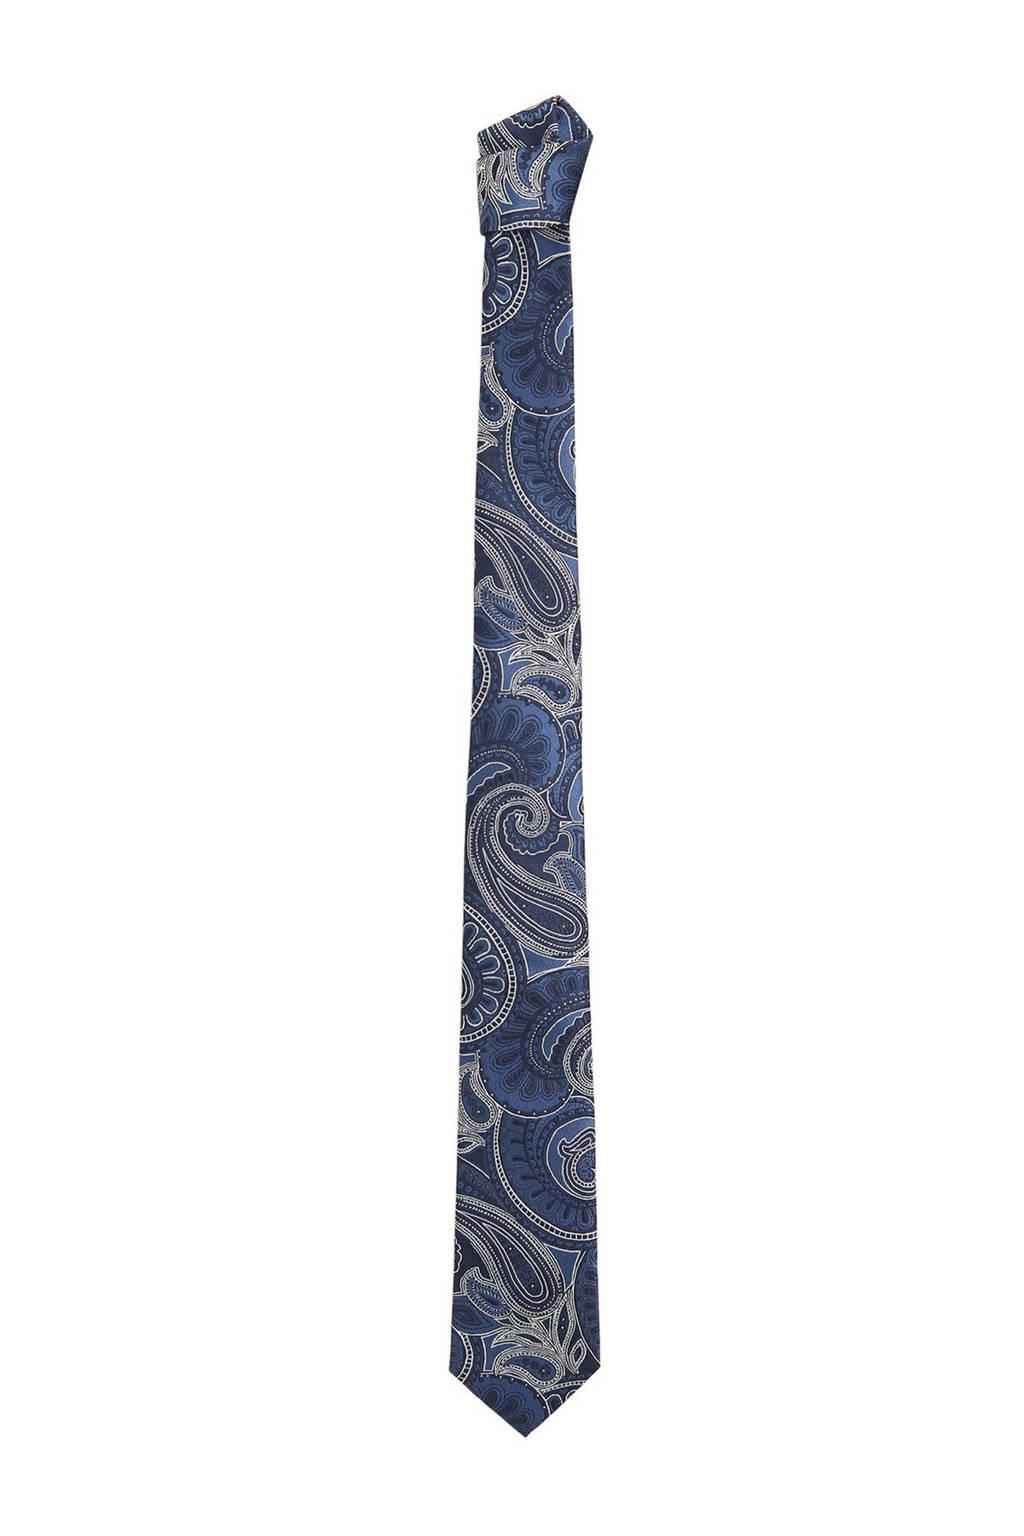 Mango Man stropdas met paisley print blauw, Blauw